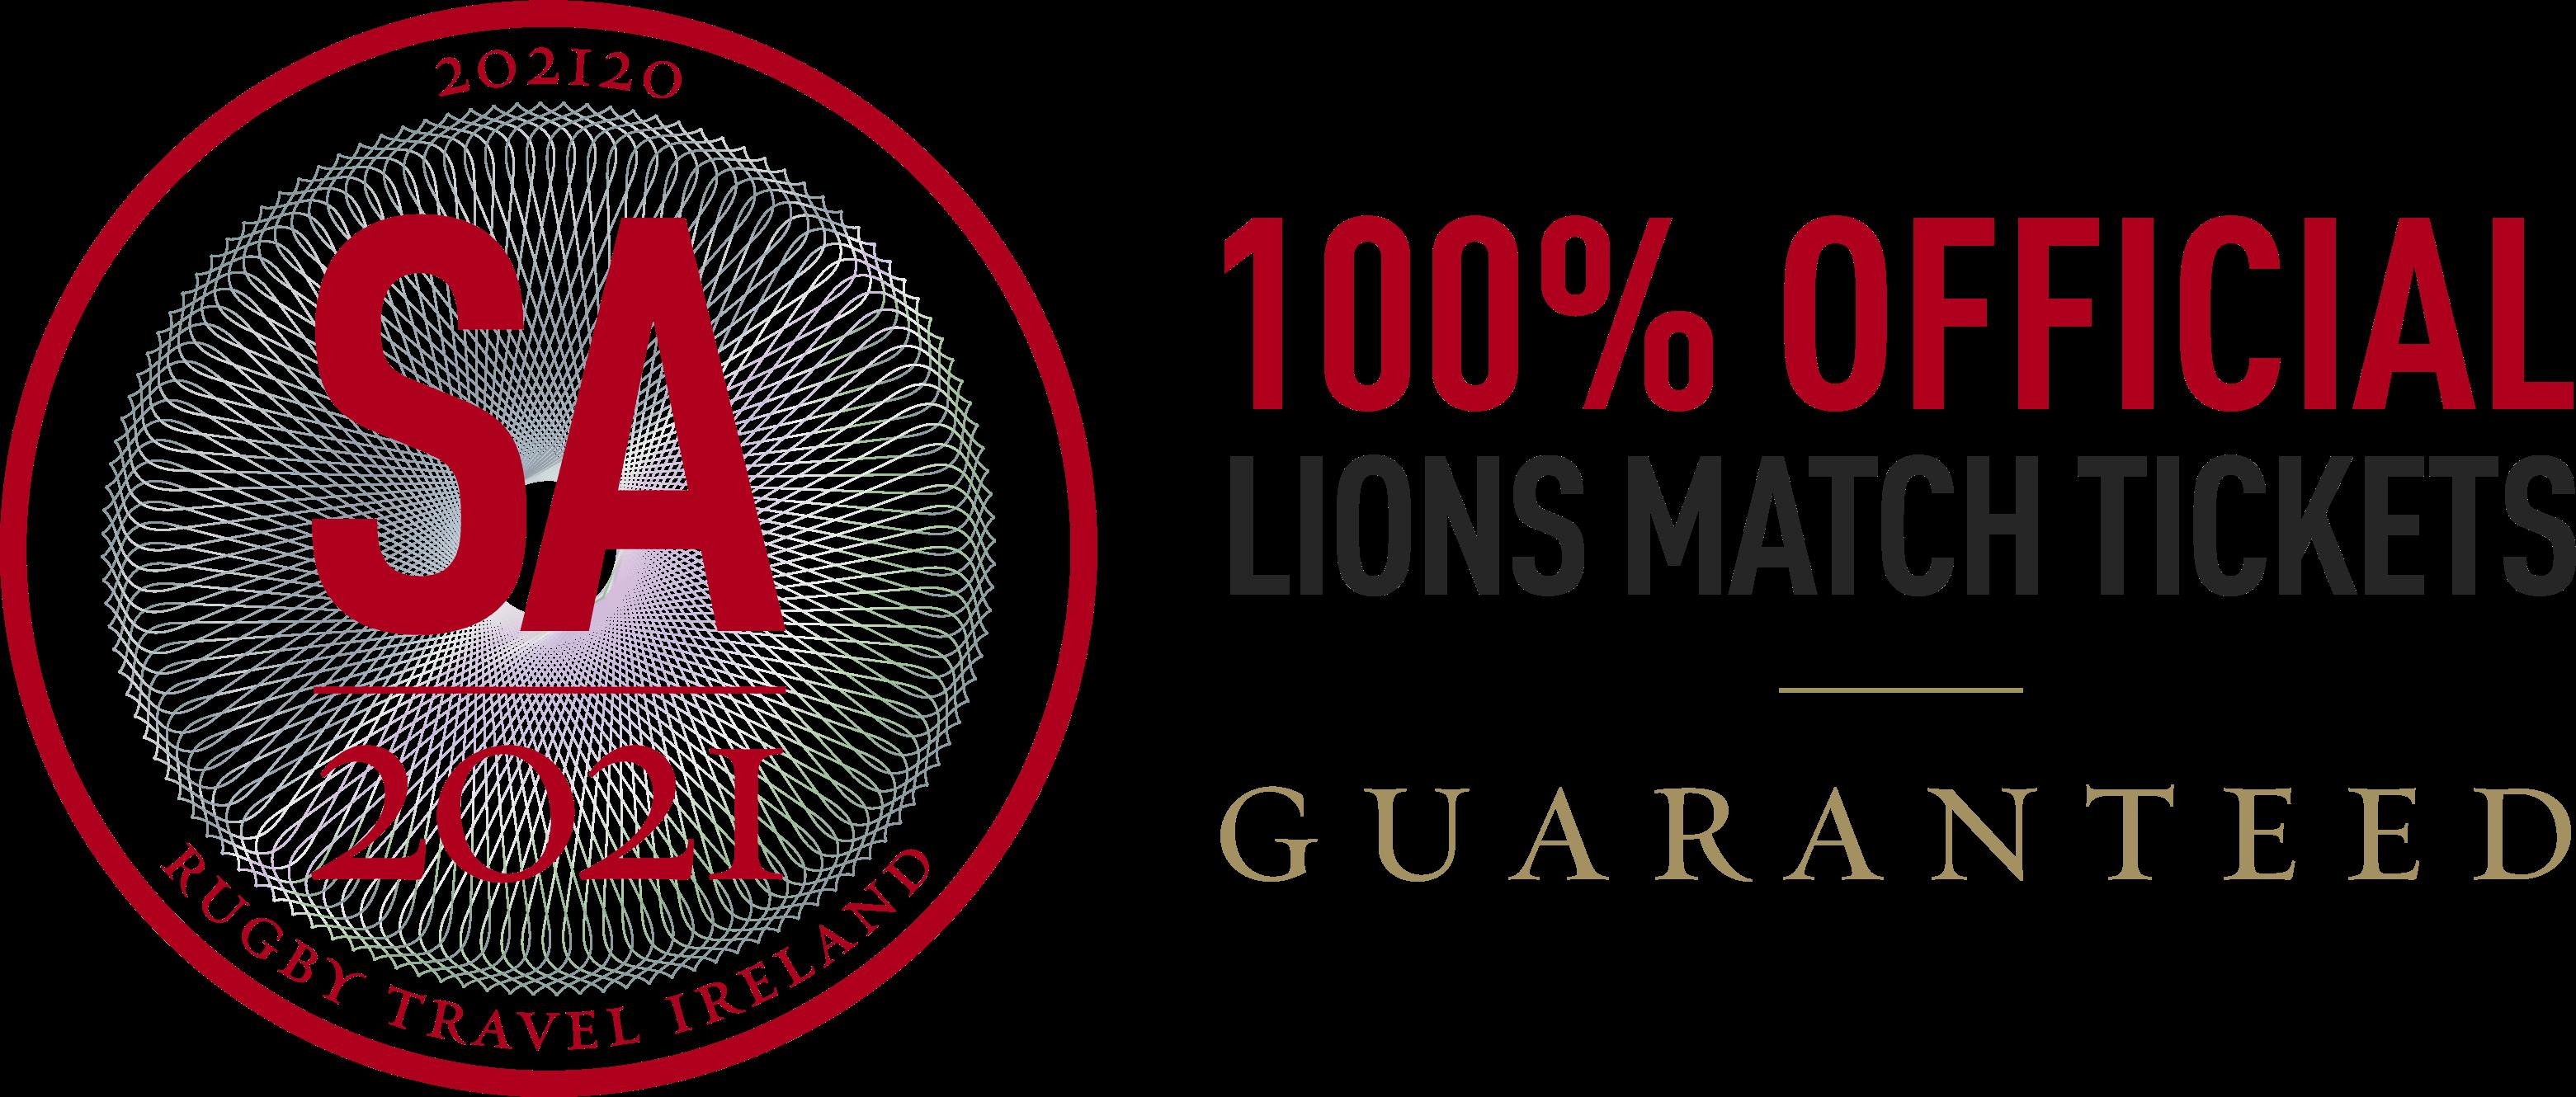 Official British & Irish Lions Tour Match Ticket Guarantee